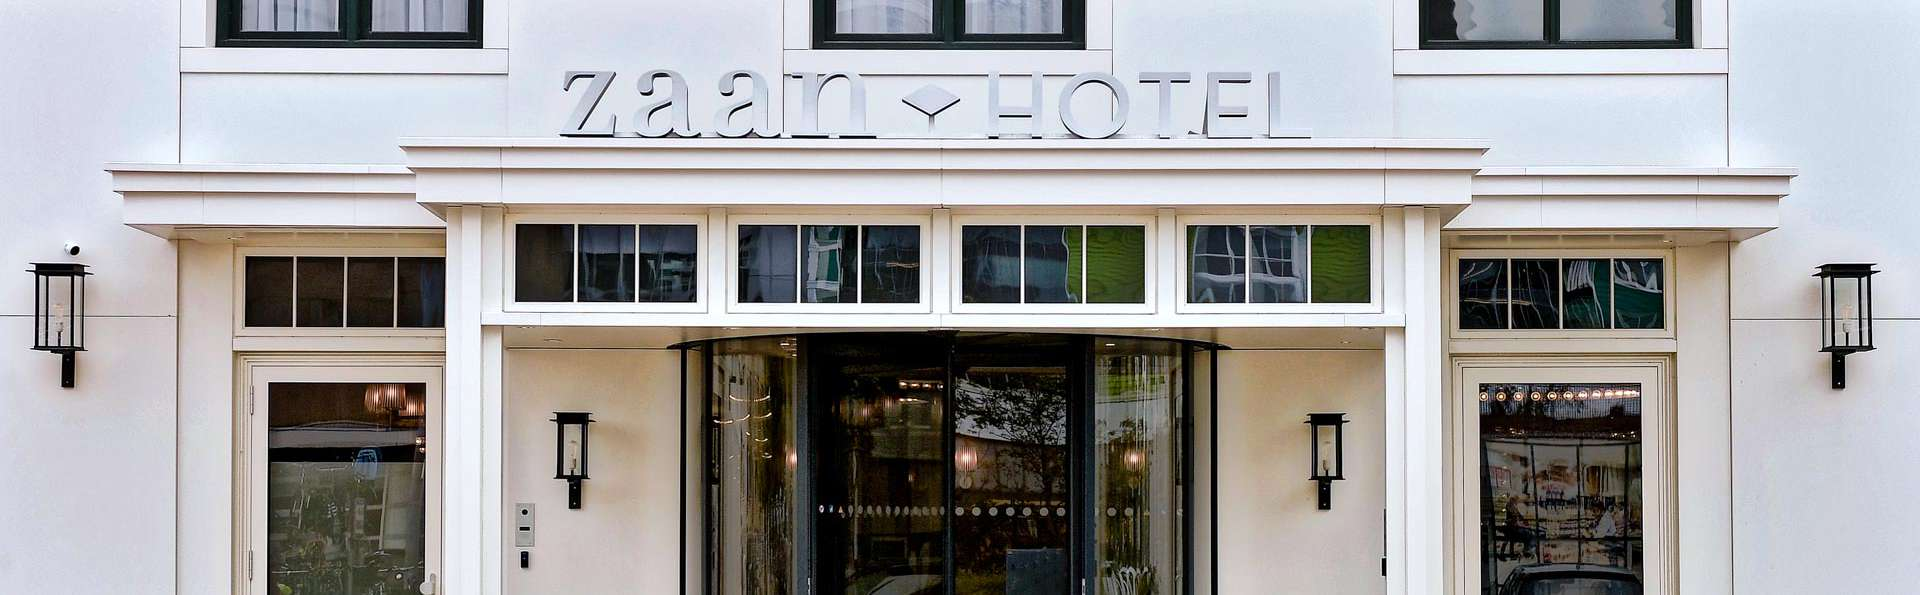 Zaan Hotel Amsterdam - Zaandam - EDIT_FRONT_01.jpg